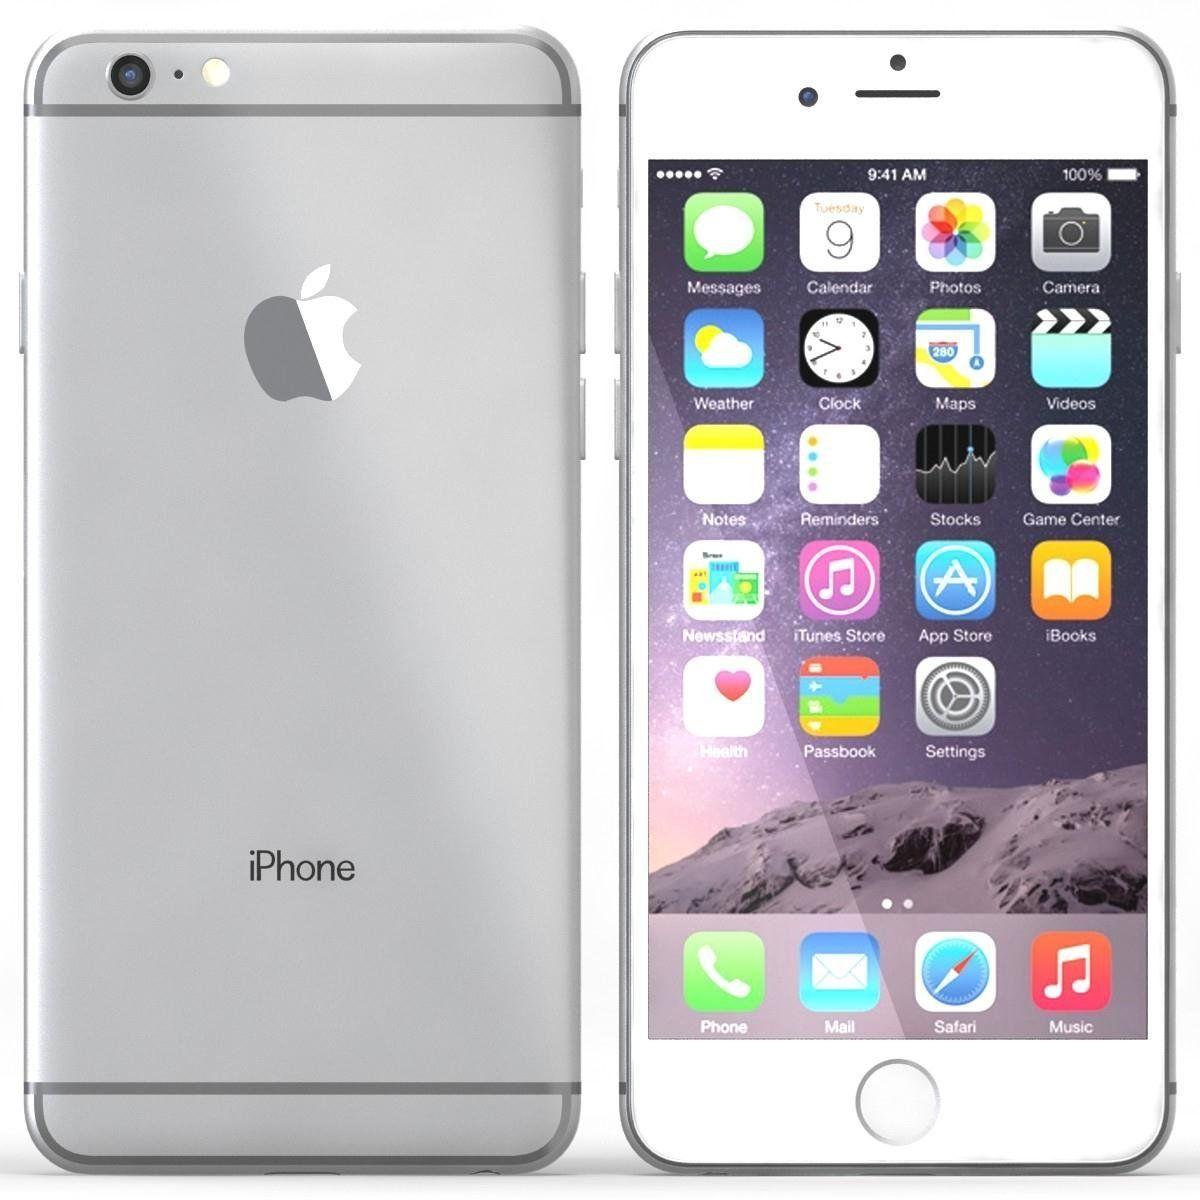 Apple Iphone 6 Plus Space Gray 128gb Unlocked Smartphone Certified Refurbished Apple Iphone 6 Apple Mobile Apple Iphone 6s Plus